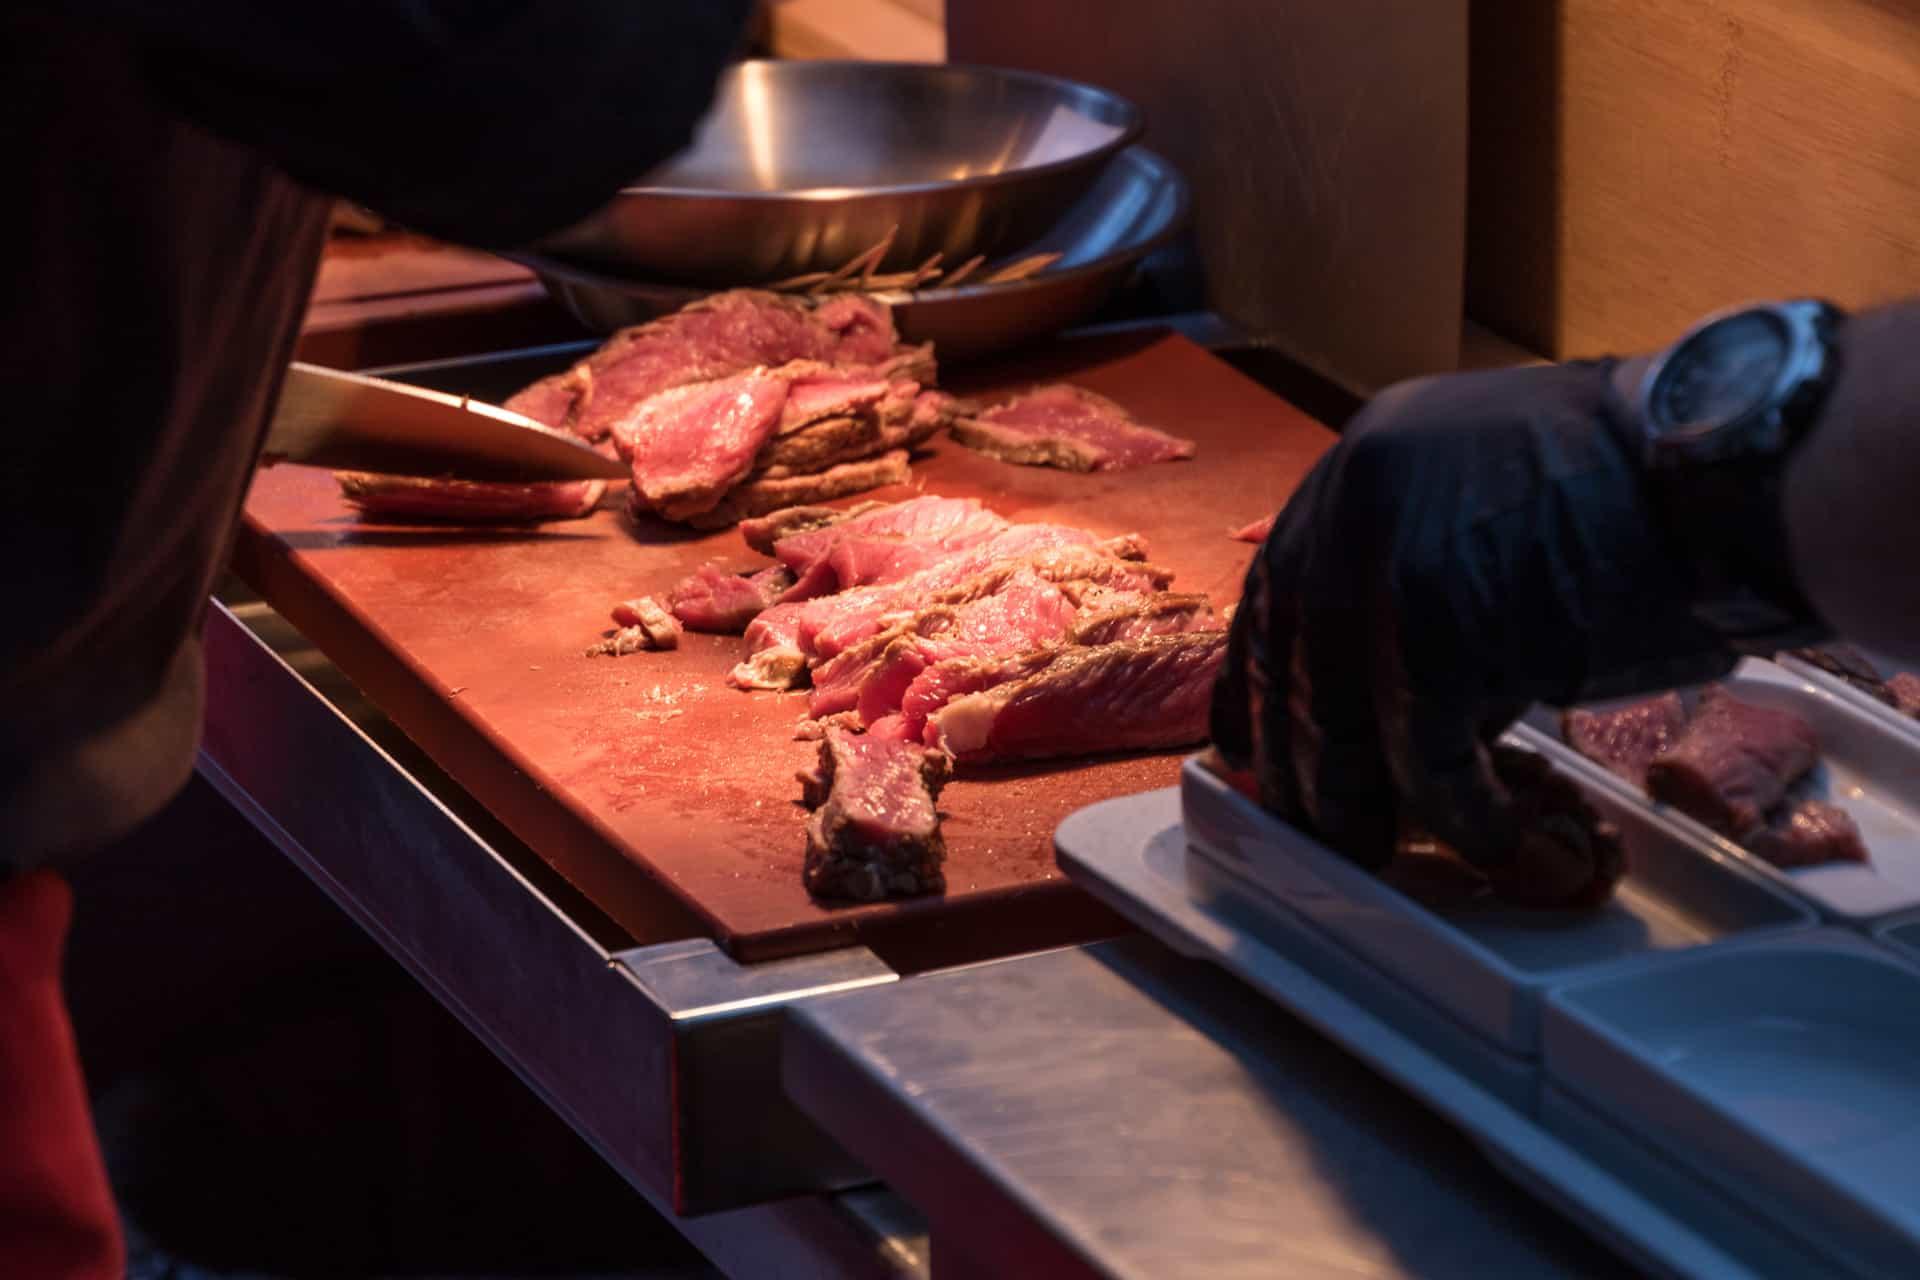 Adi Matzek Grillschule Steak Tasting Messer